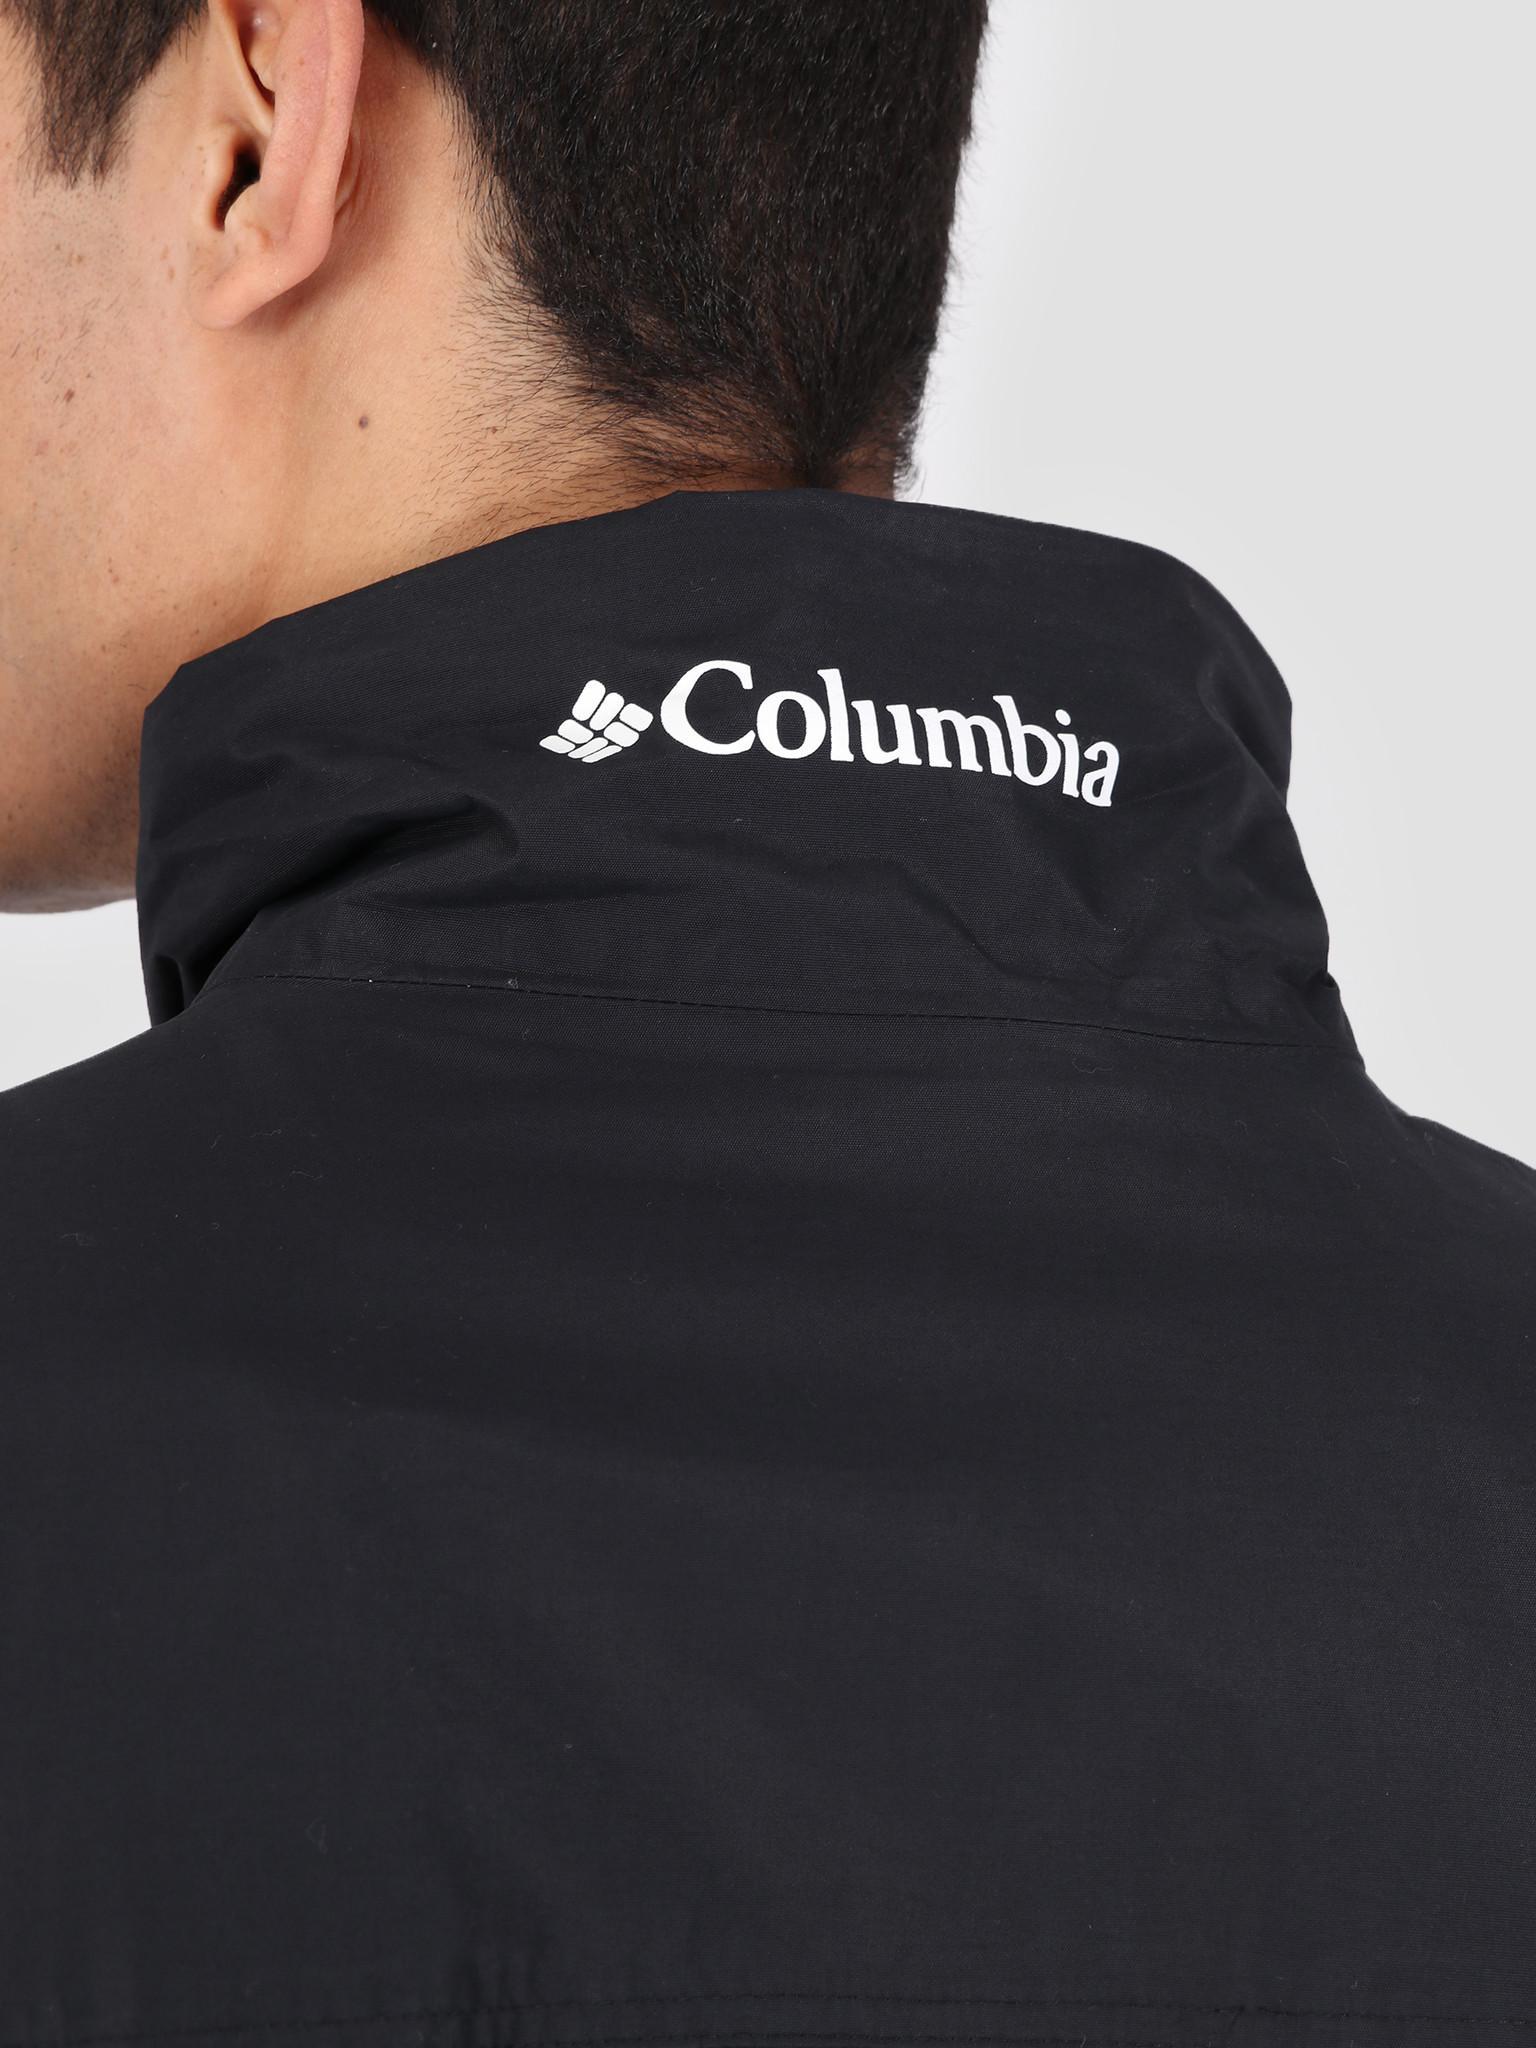 Columbia Columbia Bradley Peak Jacket Black 1772771010